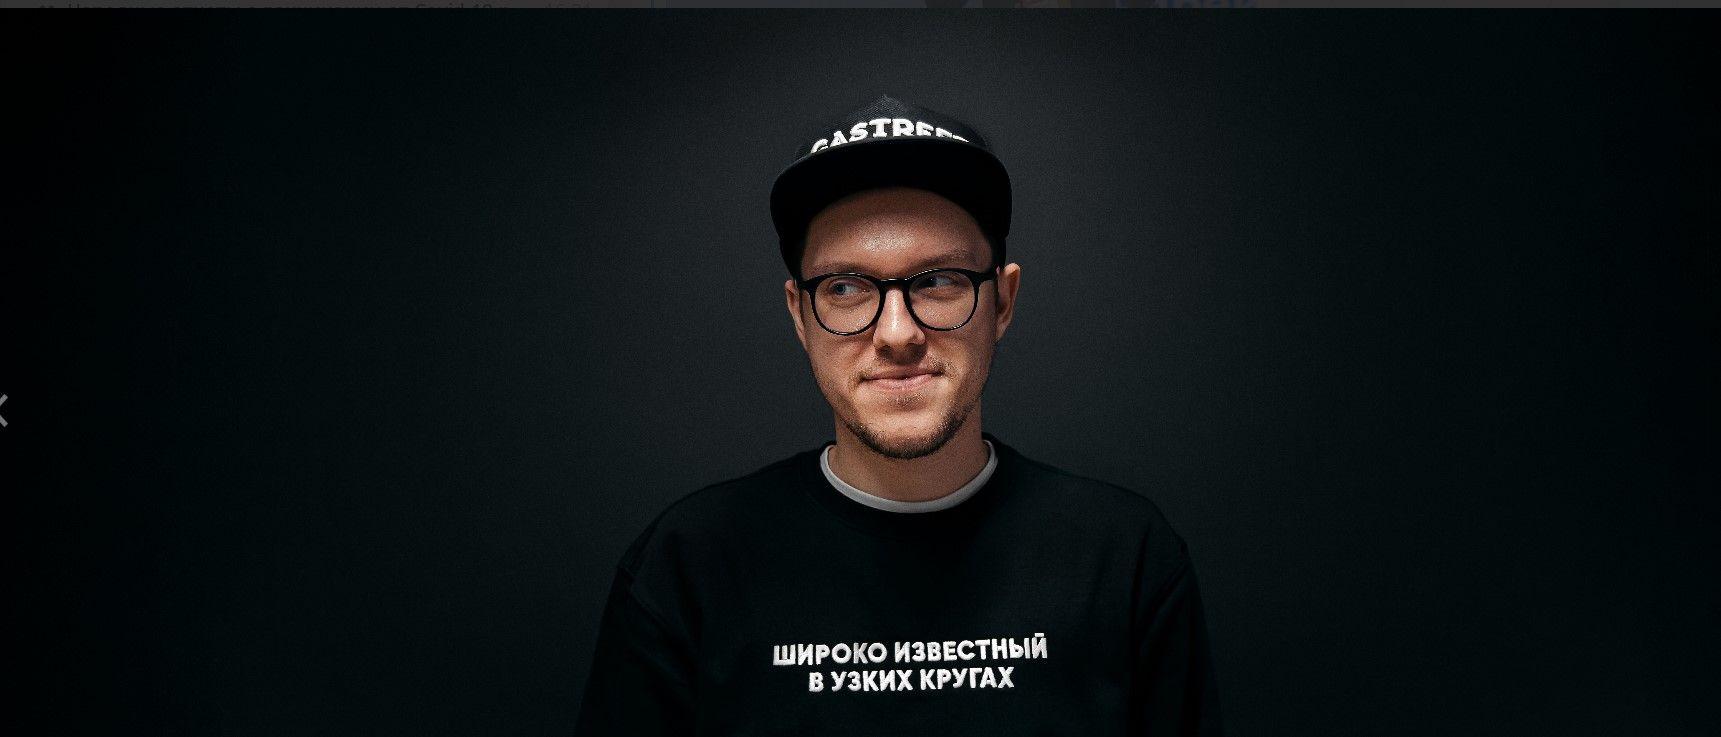 SMM-щик, хайпбист и пианист Андрей Фрольченков